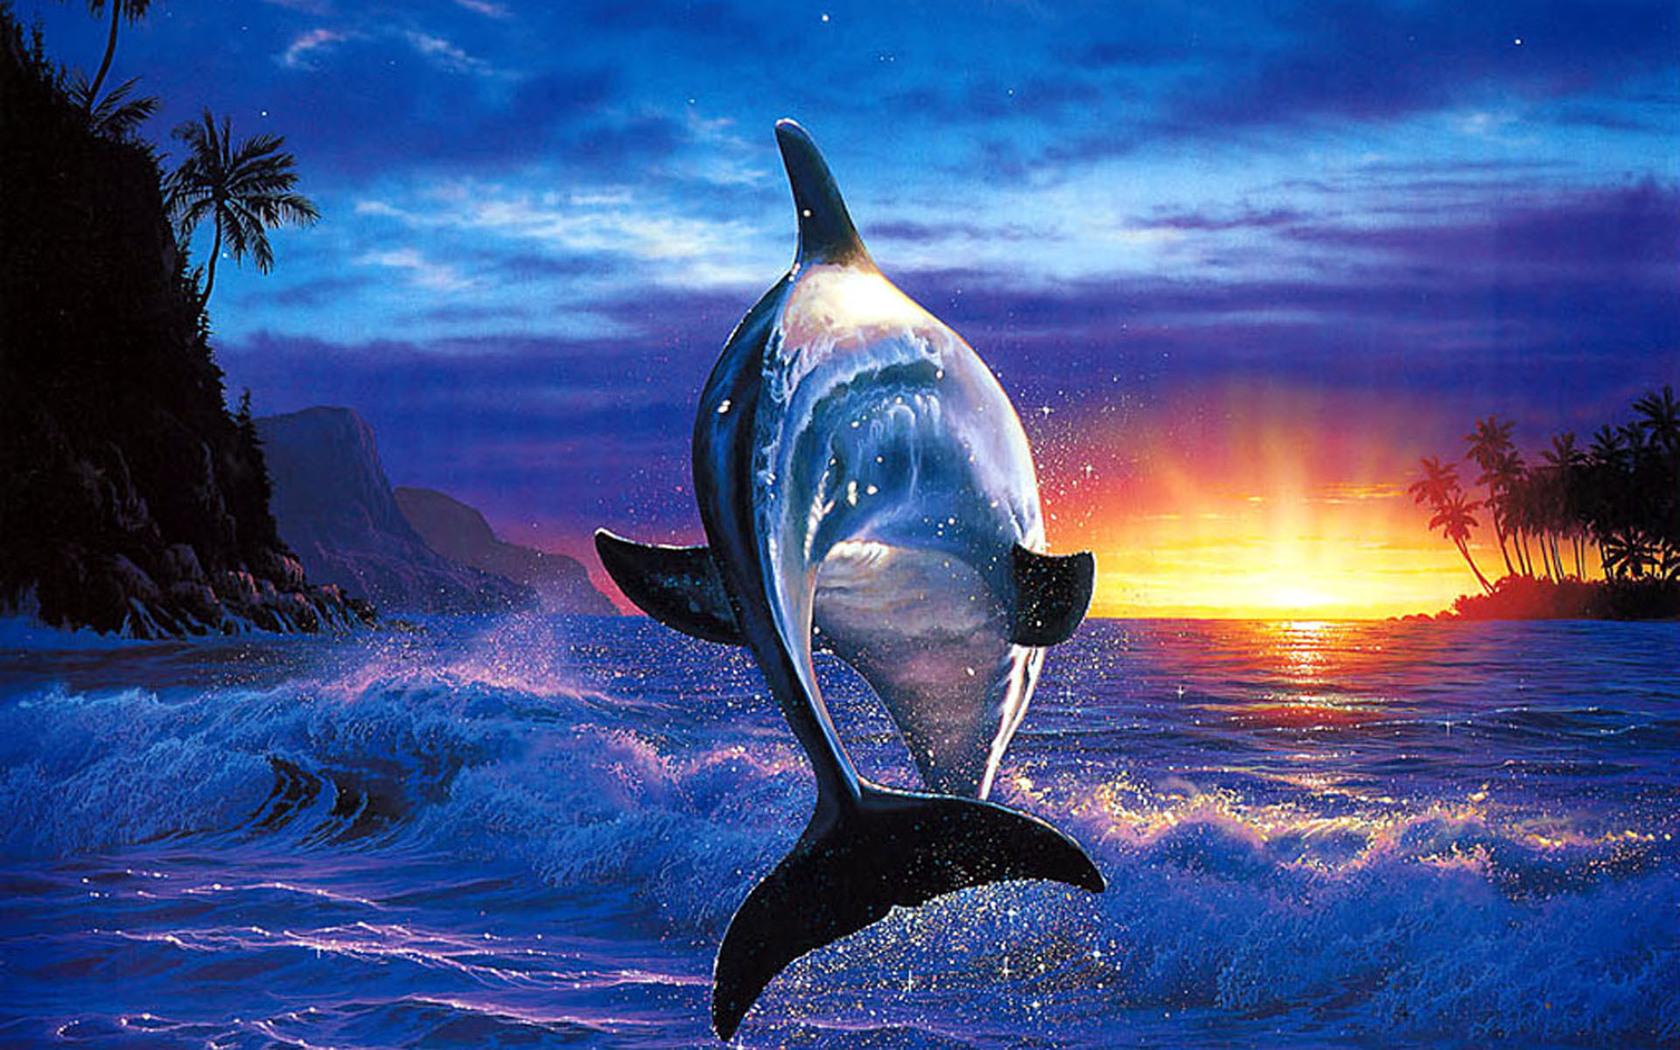 windows 1 0 wallpaper dolphin - photo #10